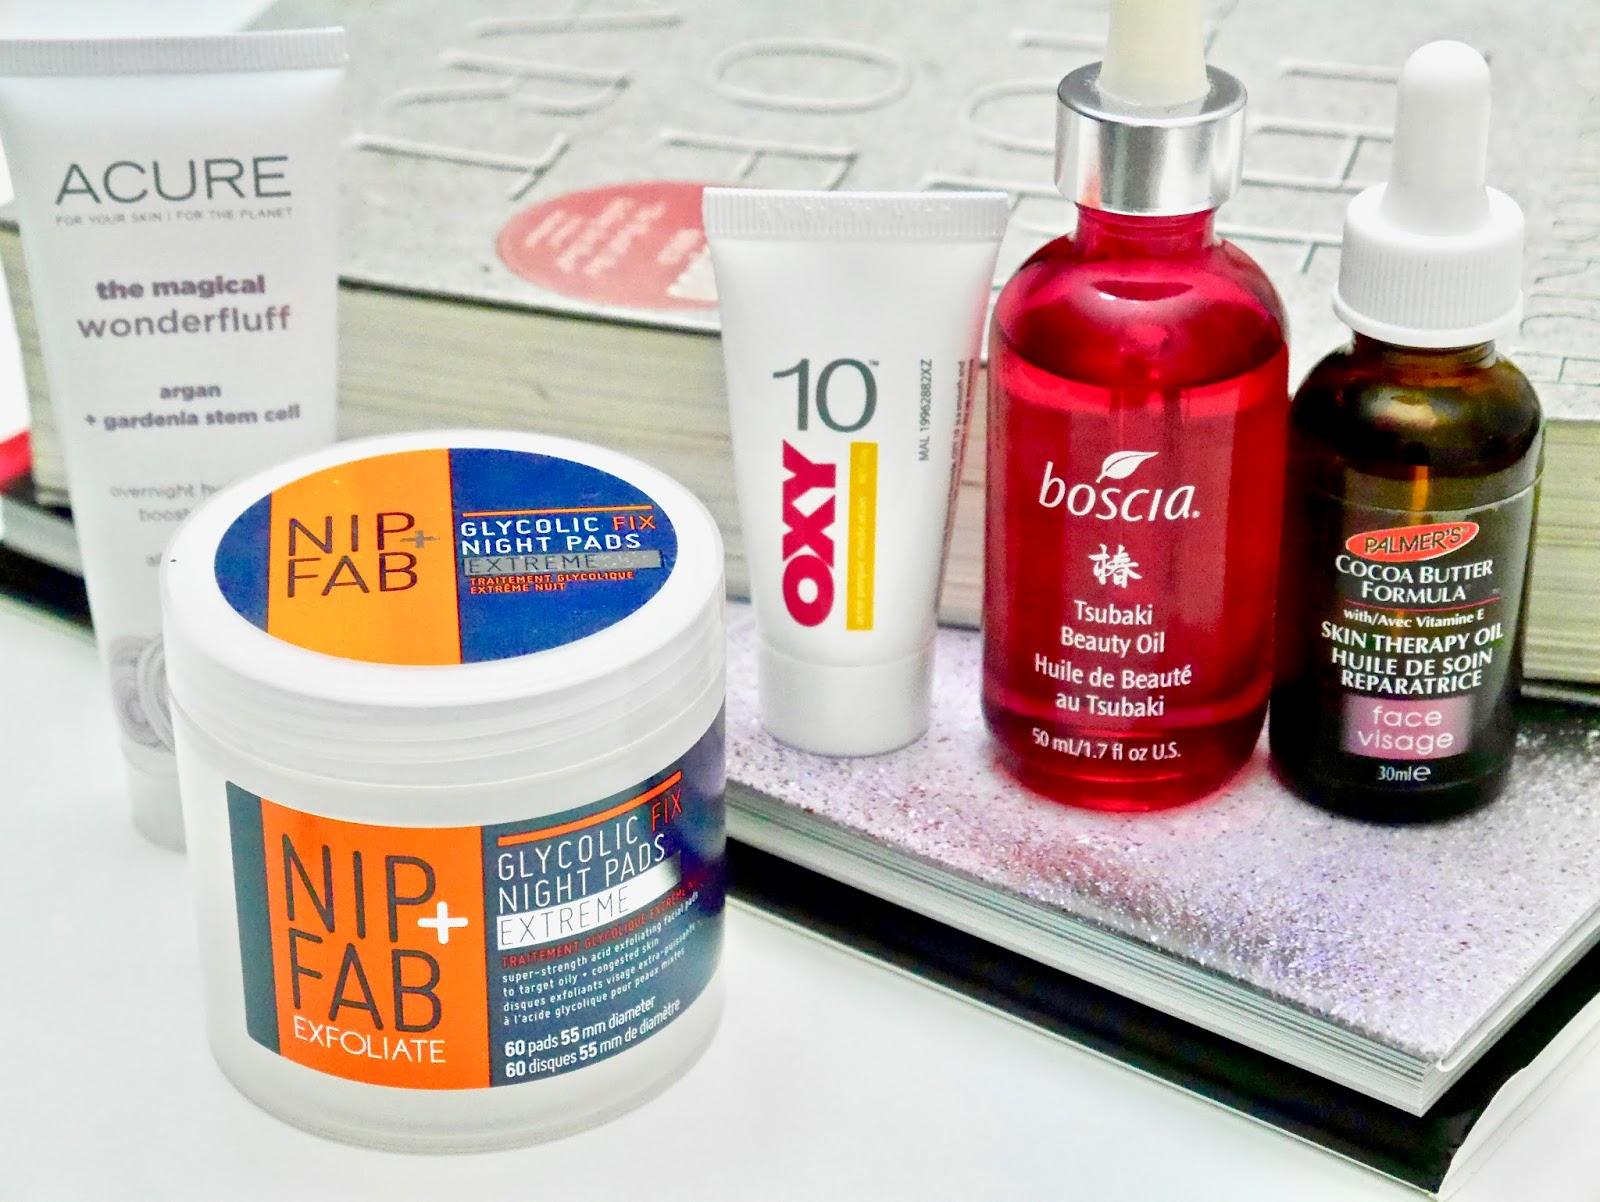 Beauty & Health, exfoliant, face mask, facial oil, mask, serum, spot treatment, bloggers, canadian beauty, bbloggersCA, skincare, beauty